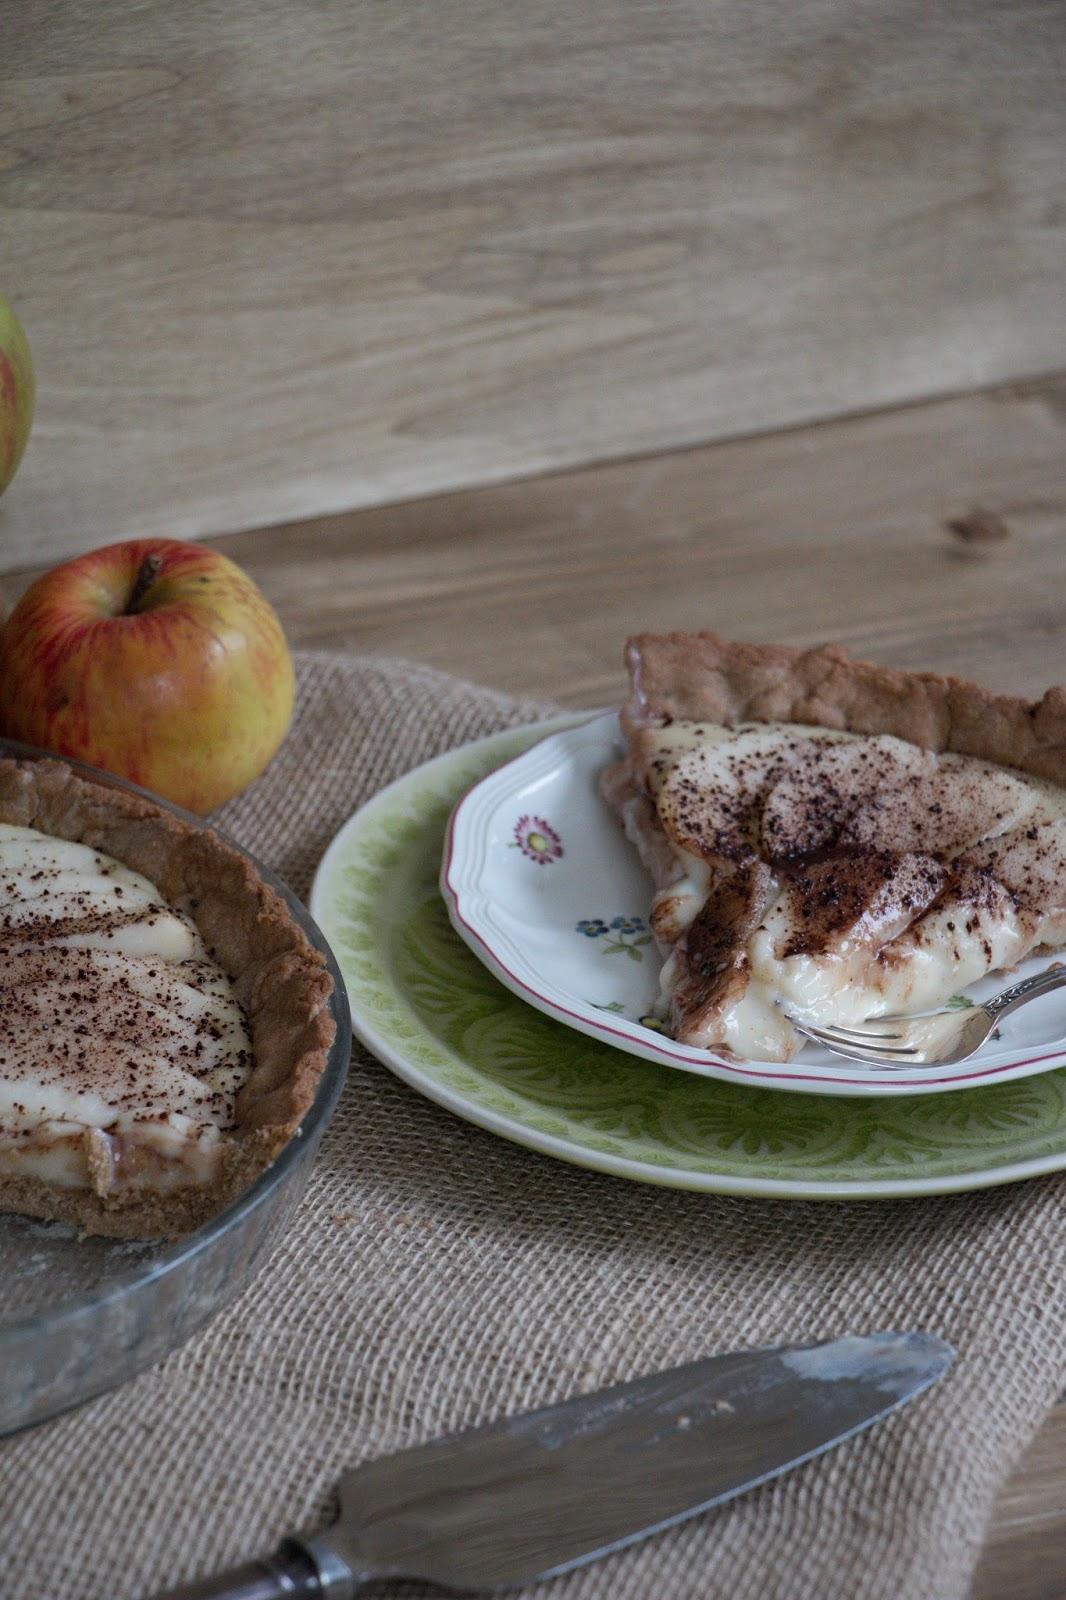 Birnenkuchen mit Kardamom-Zimt-Pudding